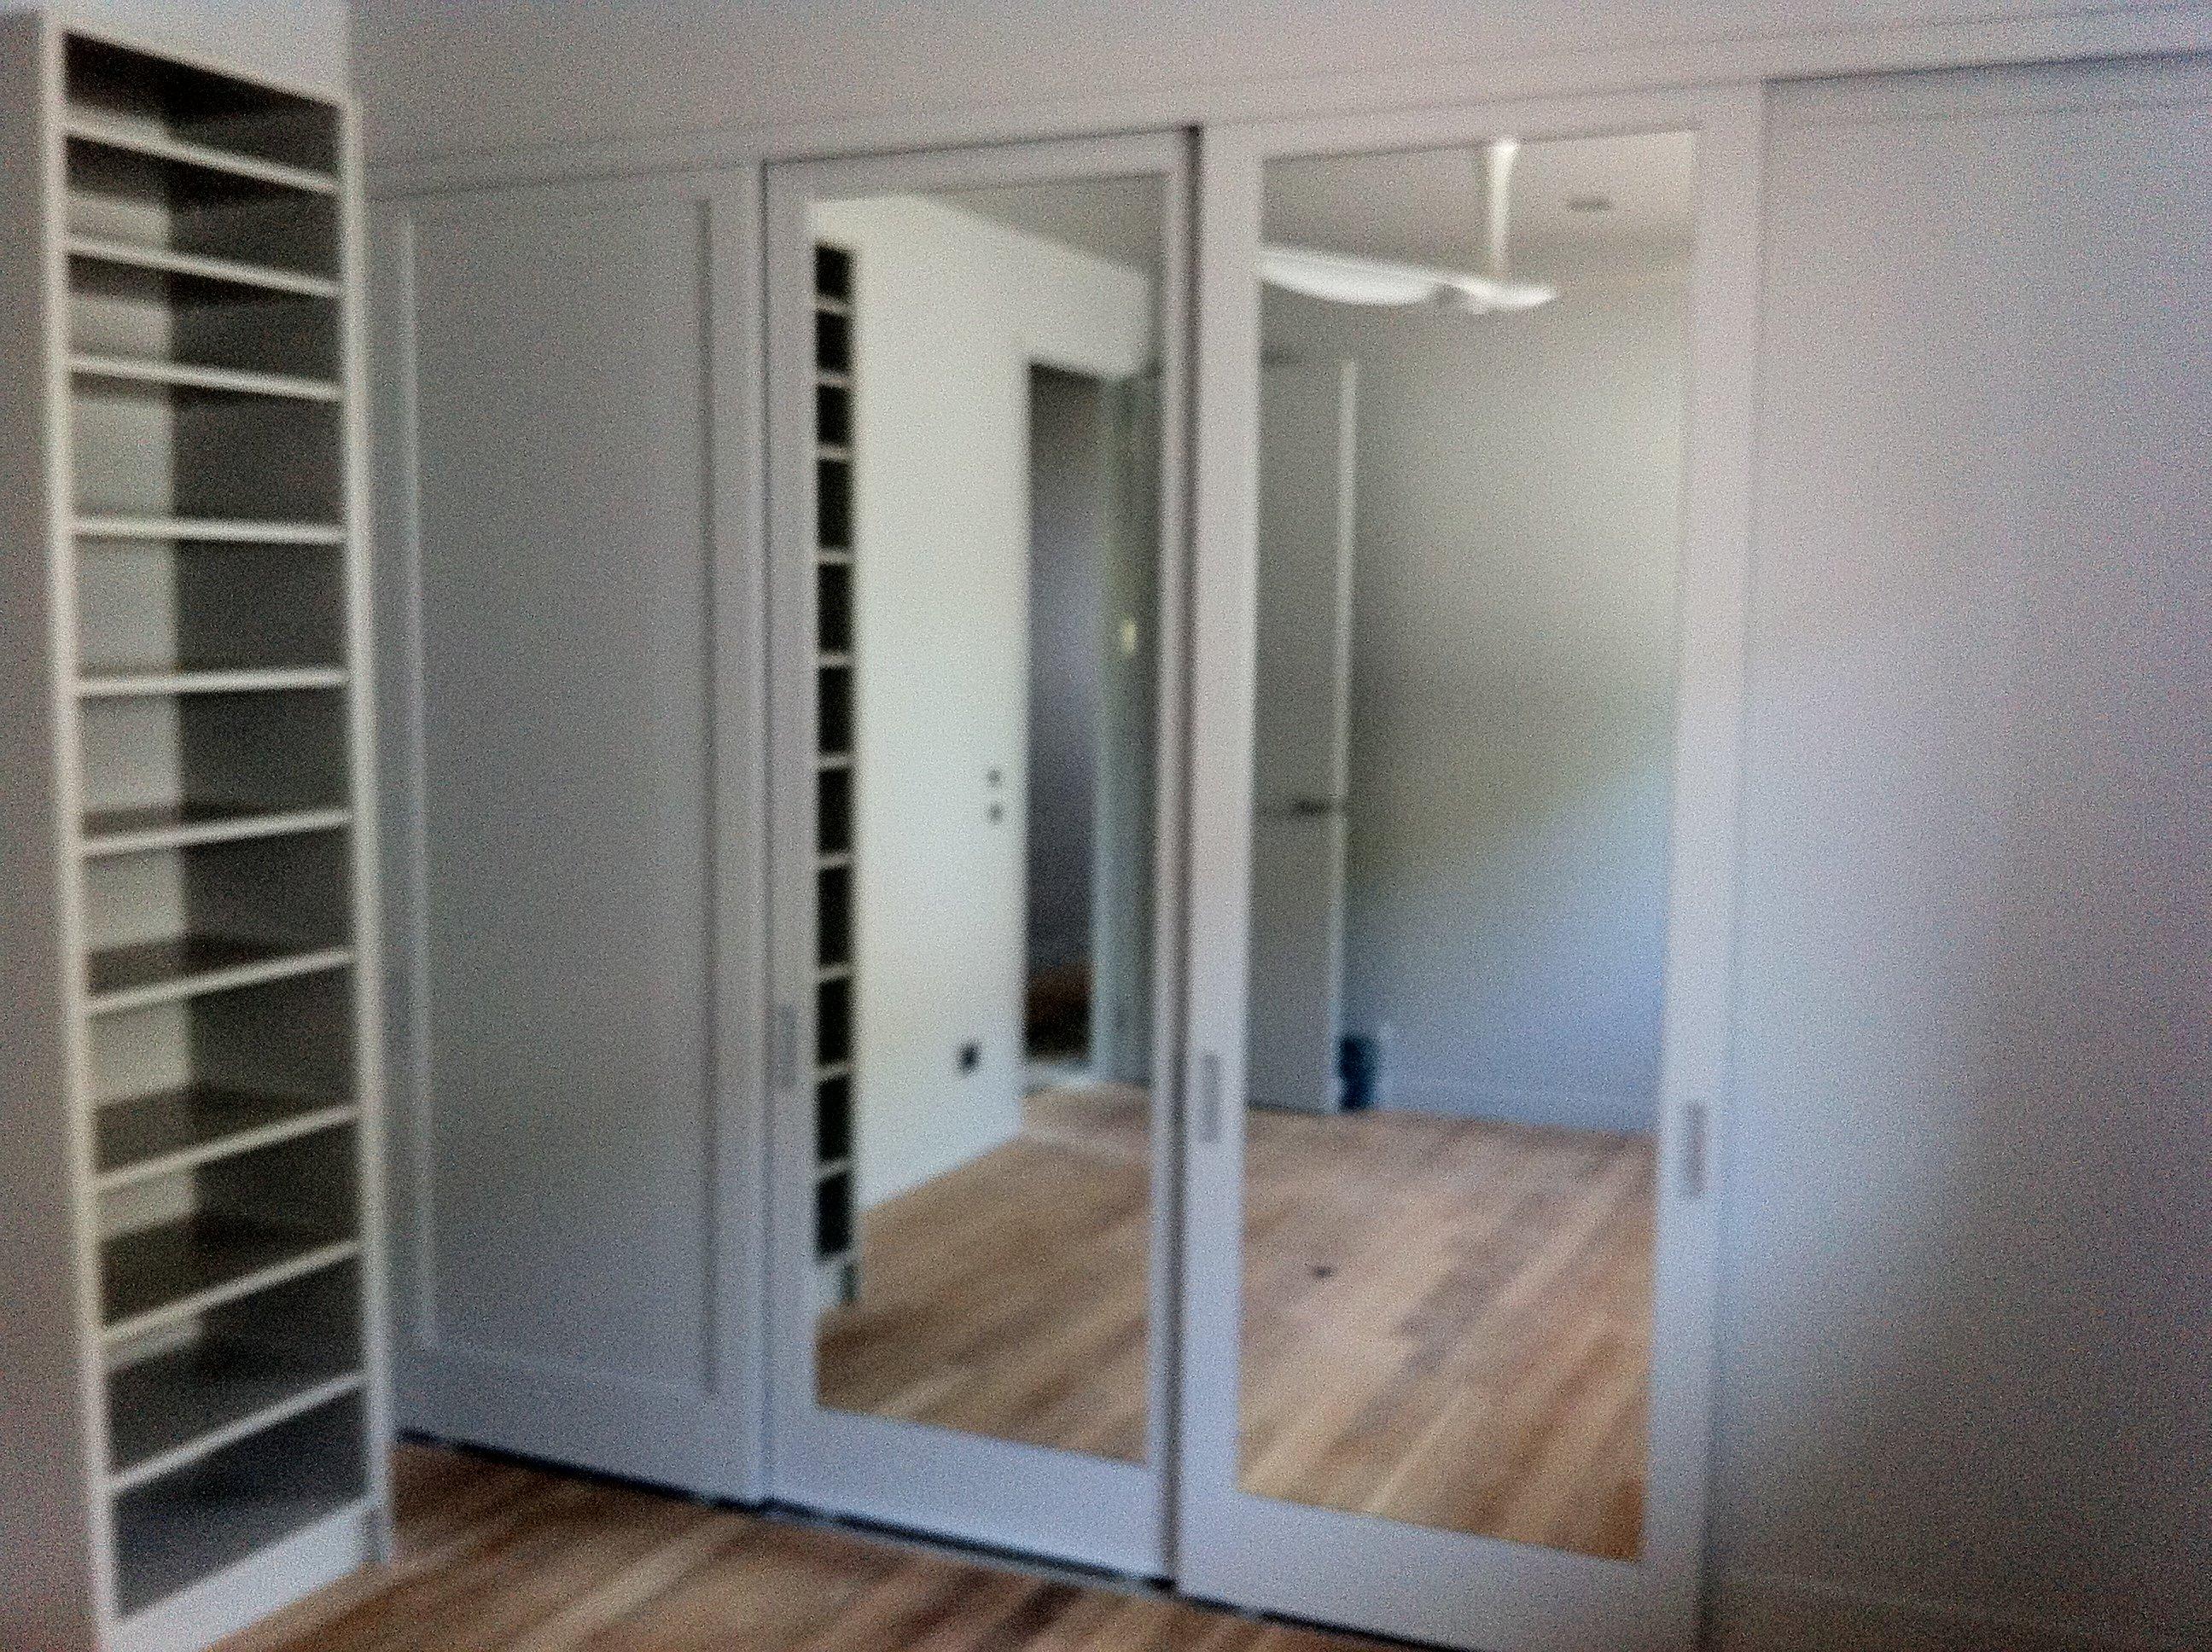 Full length mirror on doors